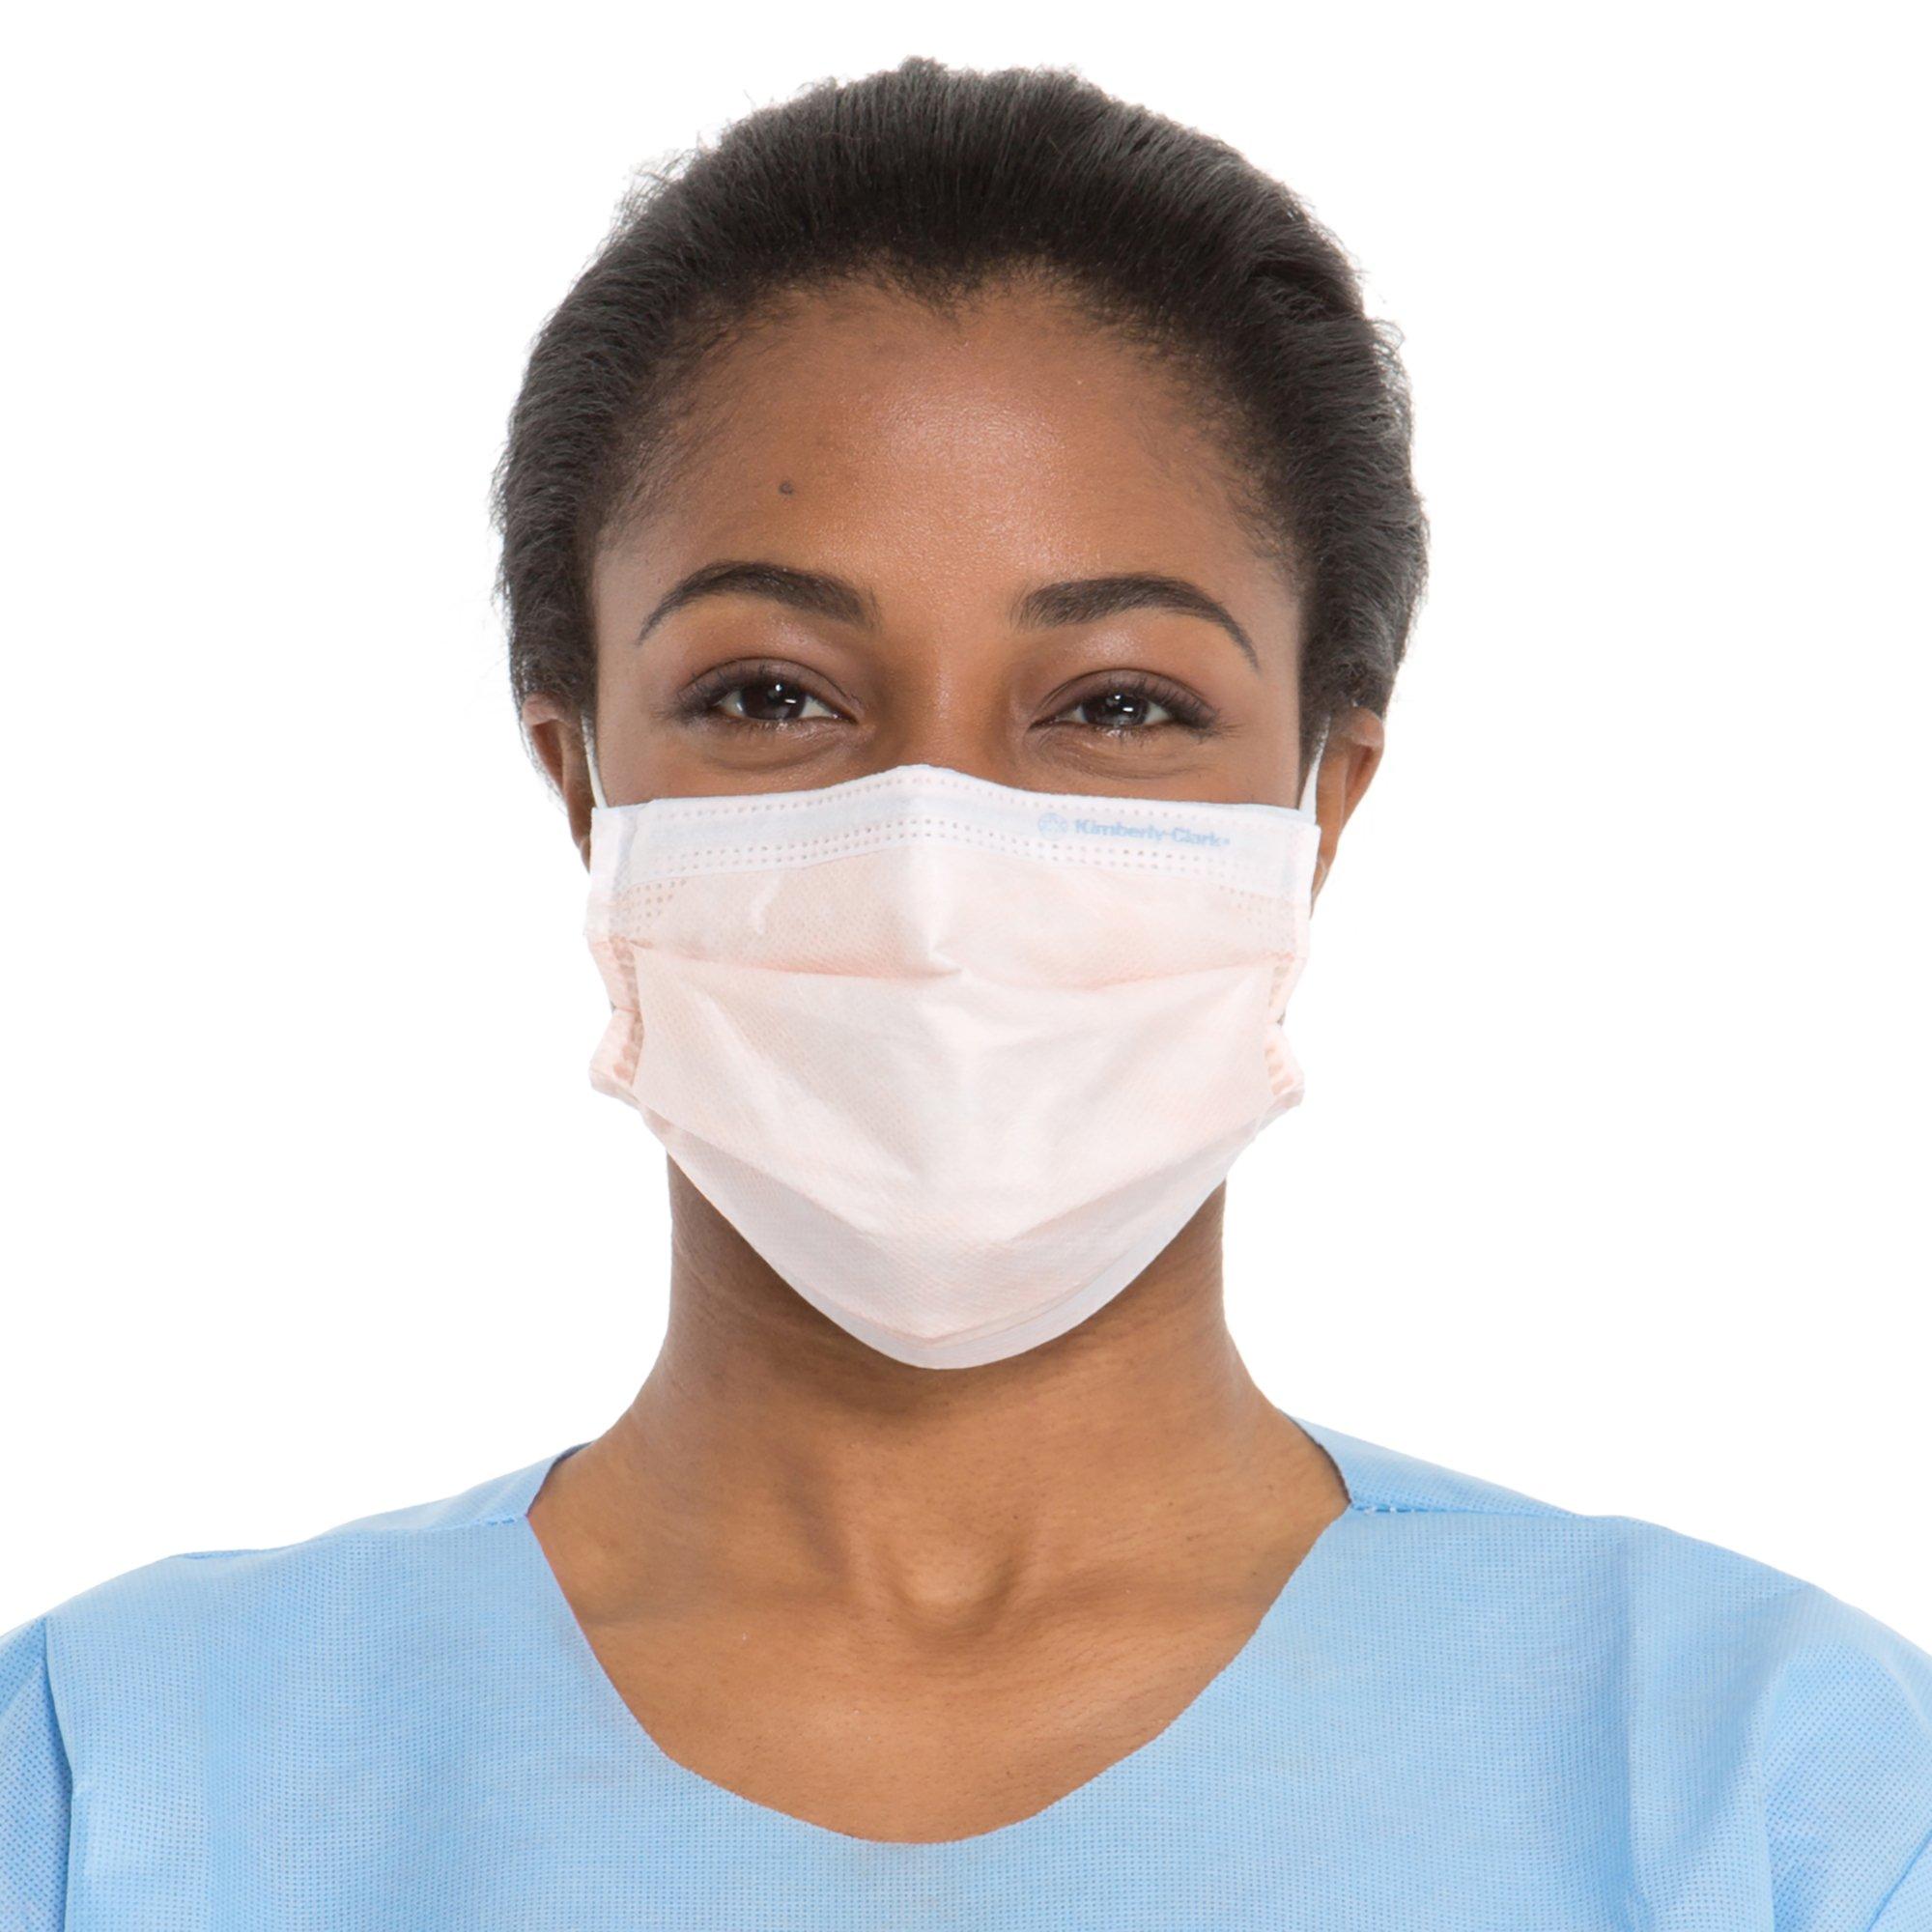 Kimberly-Clark Fluidshield Procedure Face Mask (47107), Level 3 Fluid Protection, Ear Loops, Breathable, Orange, 40 / Box by Kimberly-Clark